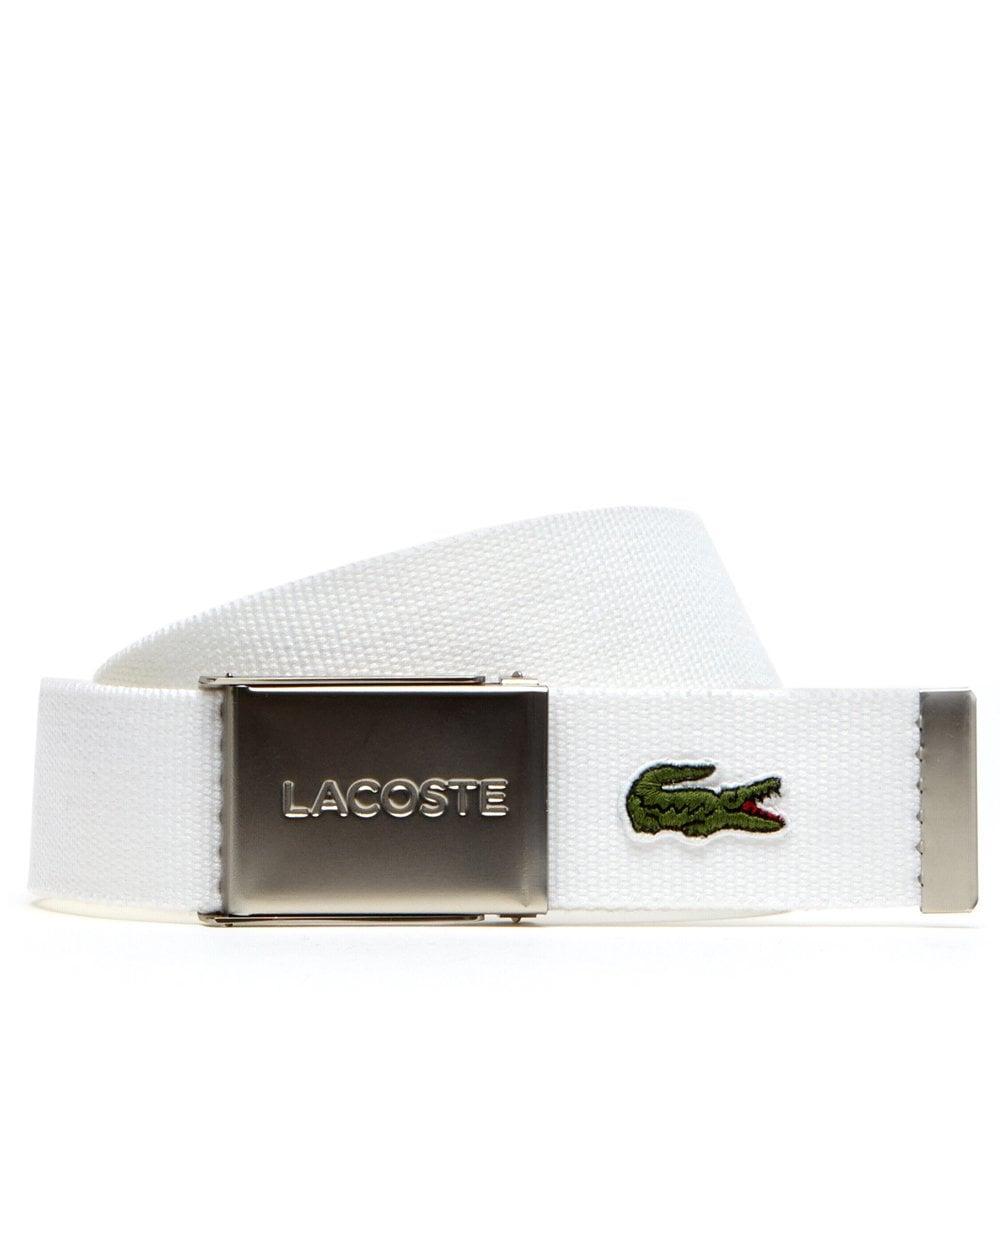 127844f51c65e4 Lacoste Lacoste Logo Belt White